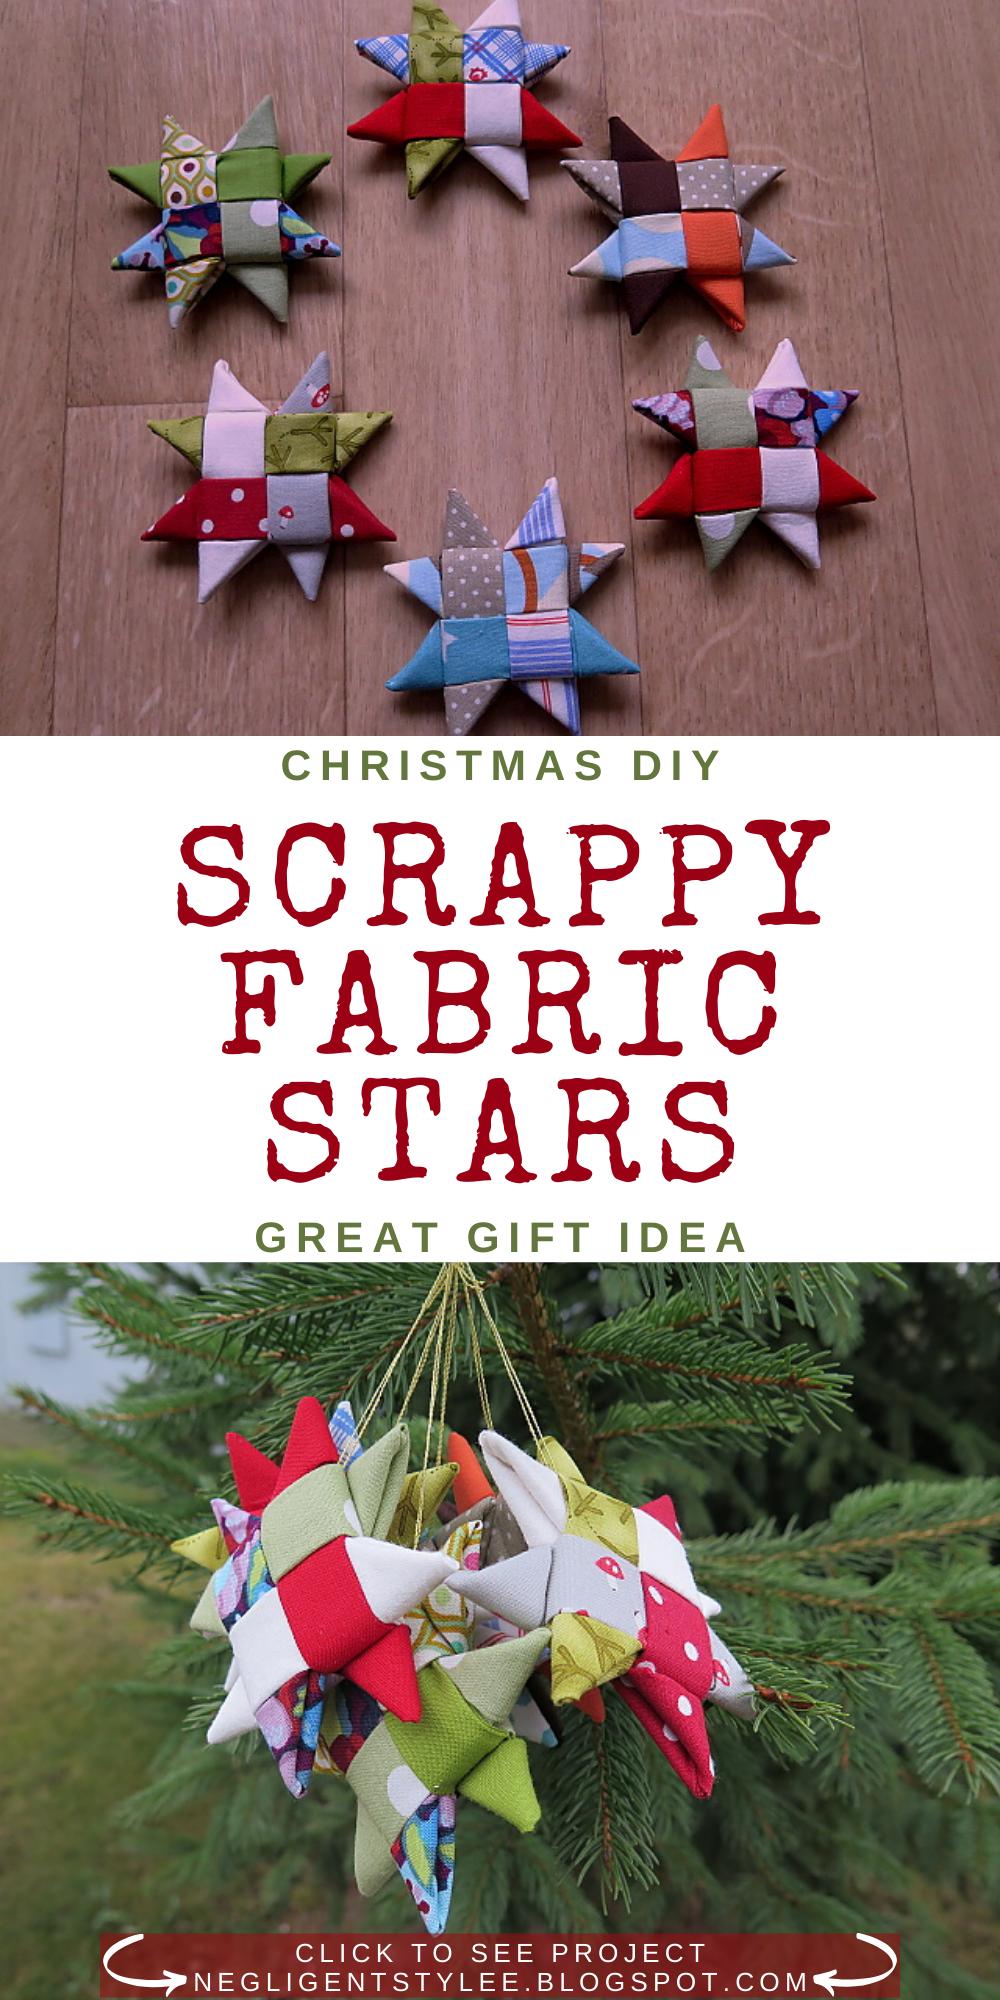 Christmas Diy Scrappy Fabric Stars Christmas Fabric Crafts Fabric Stars Christmas Diy